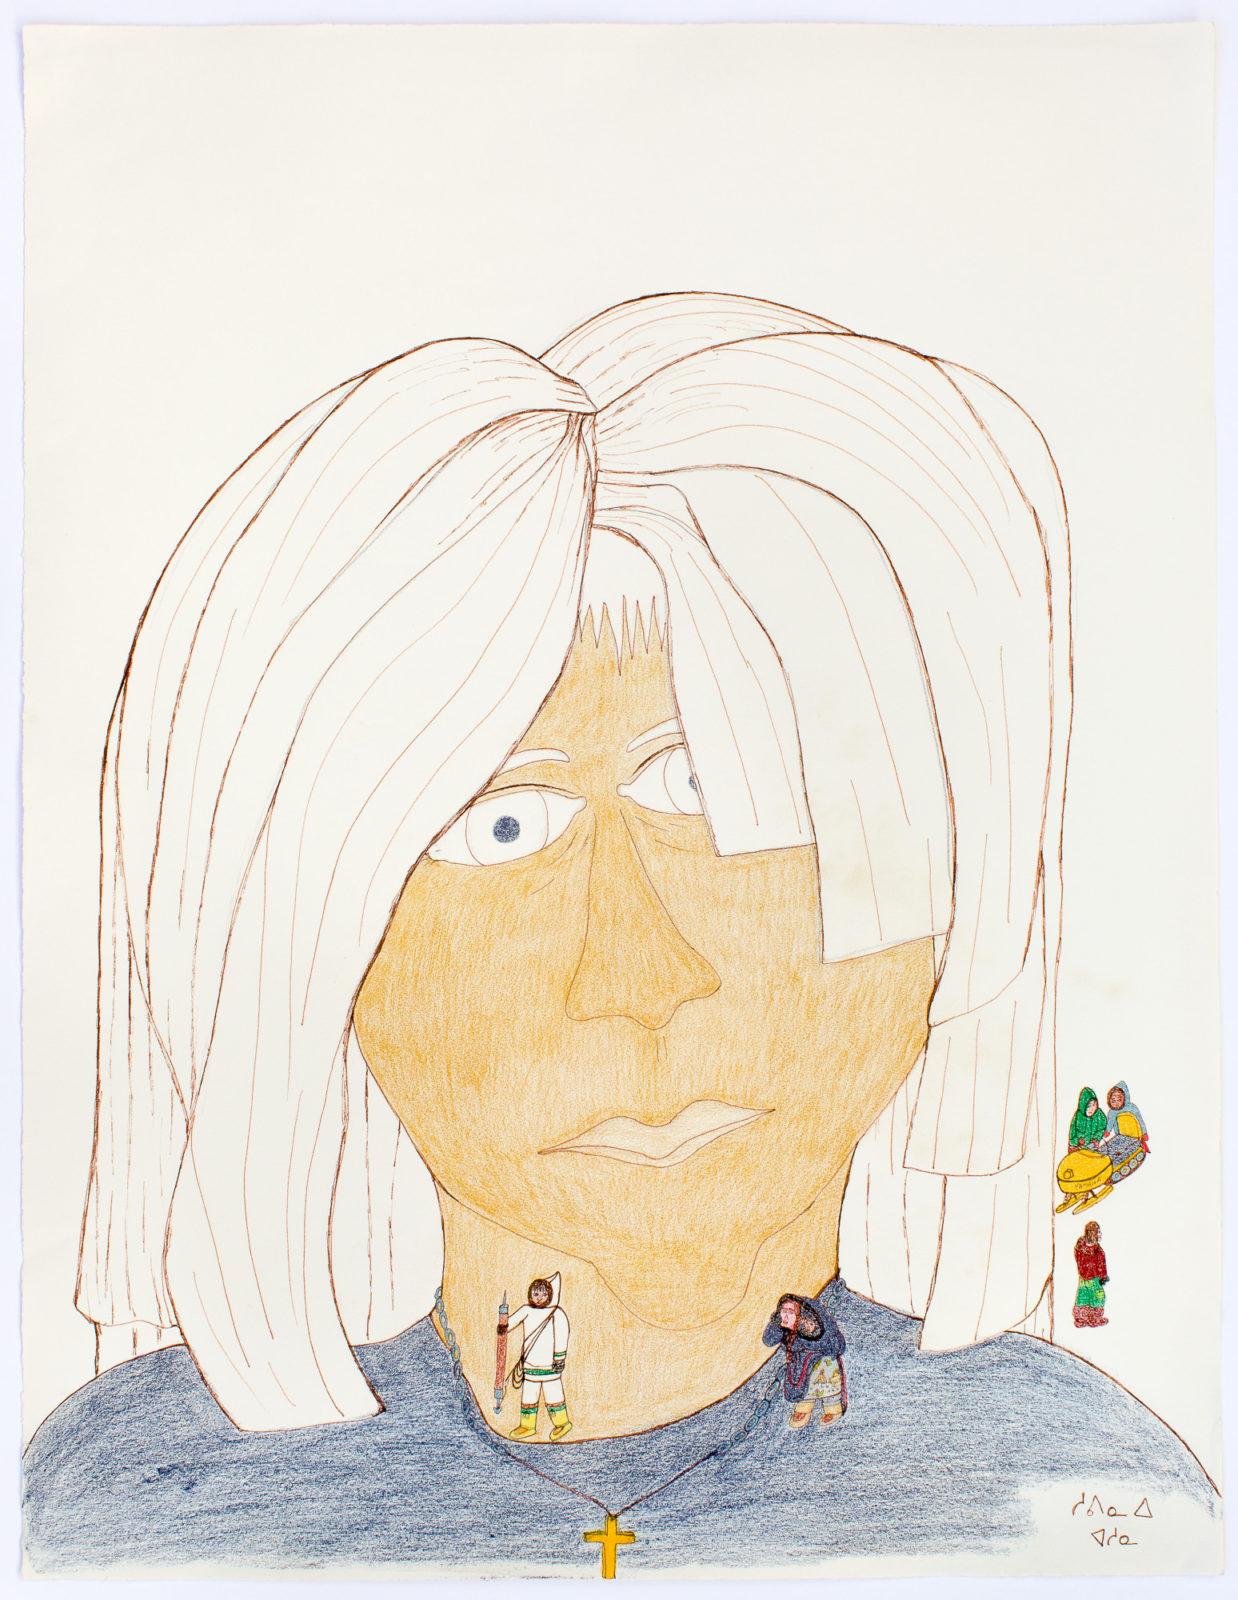 Shuvinai Ashoona - untitled (woman with small figures)